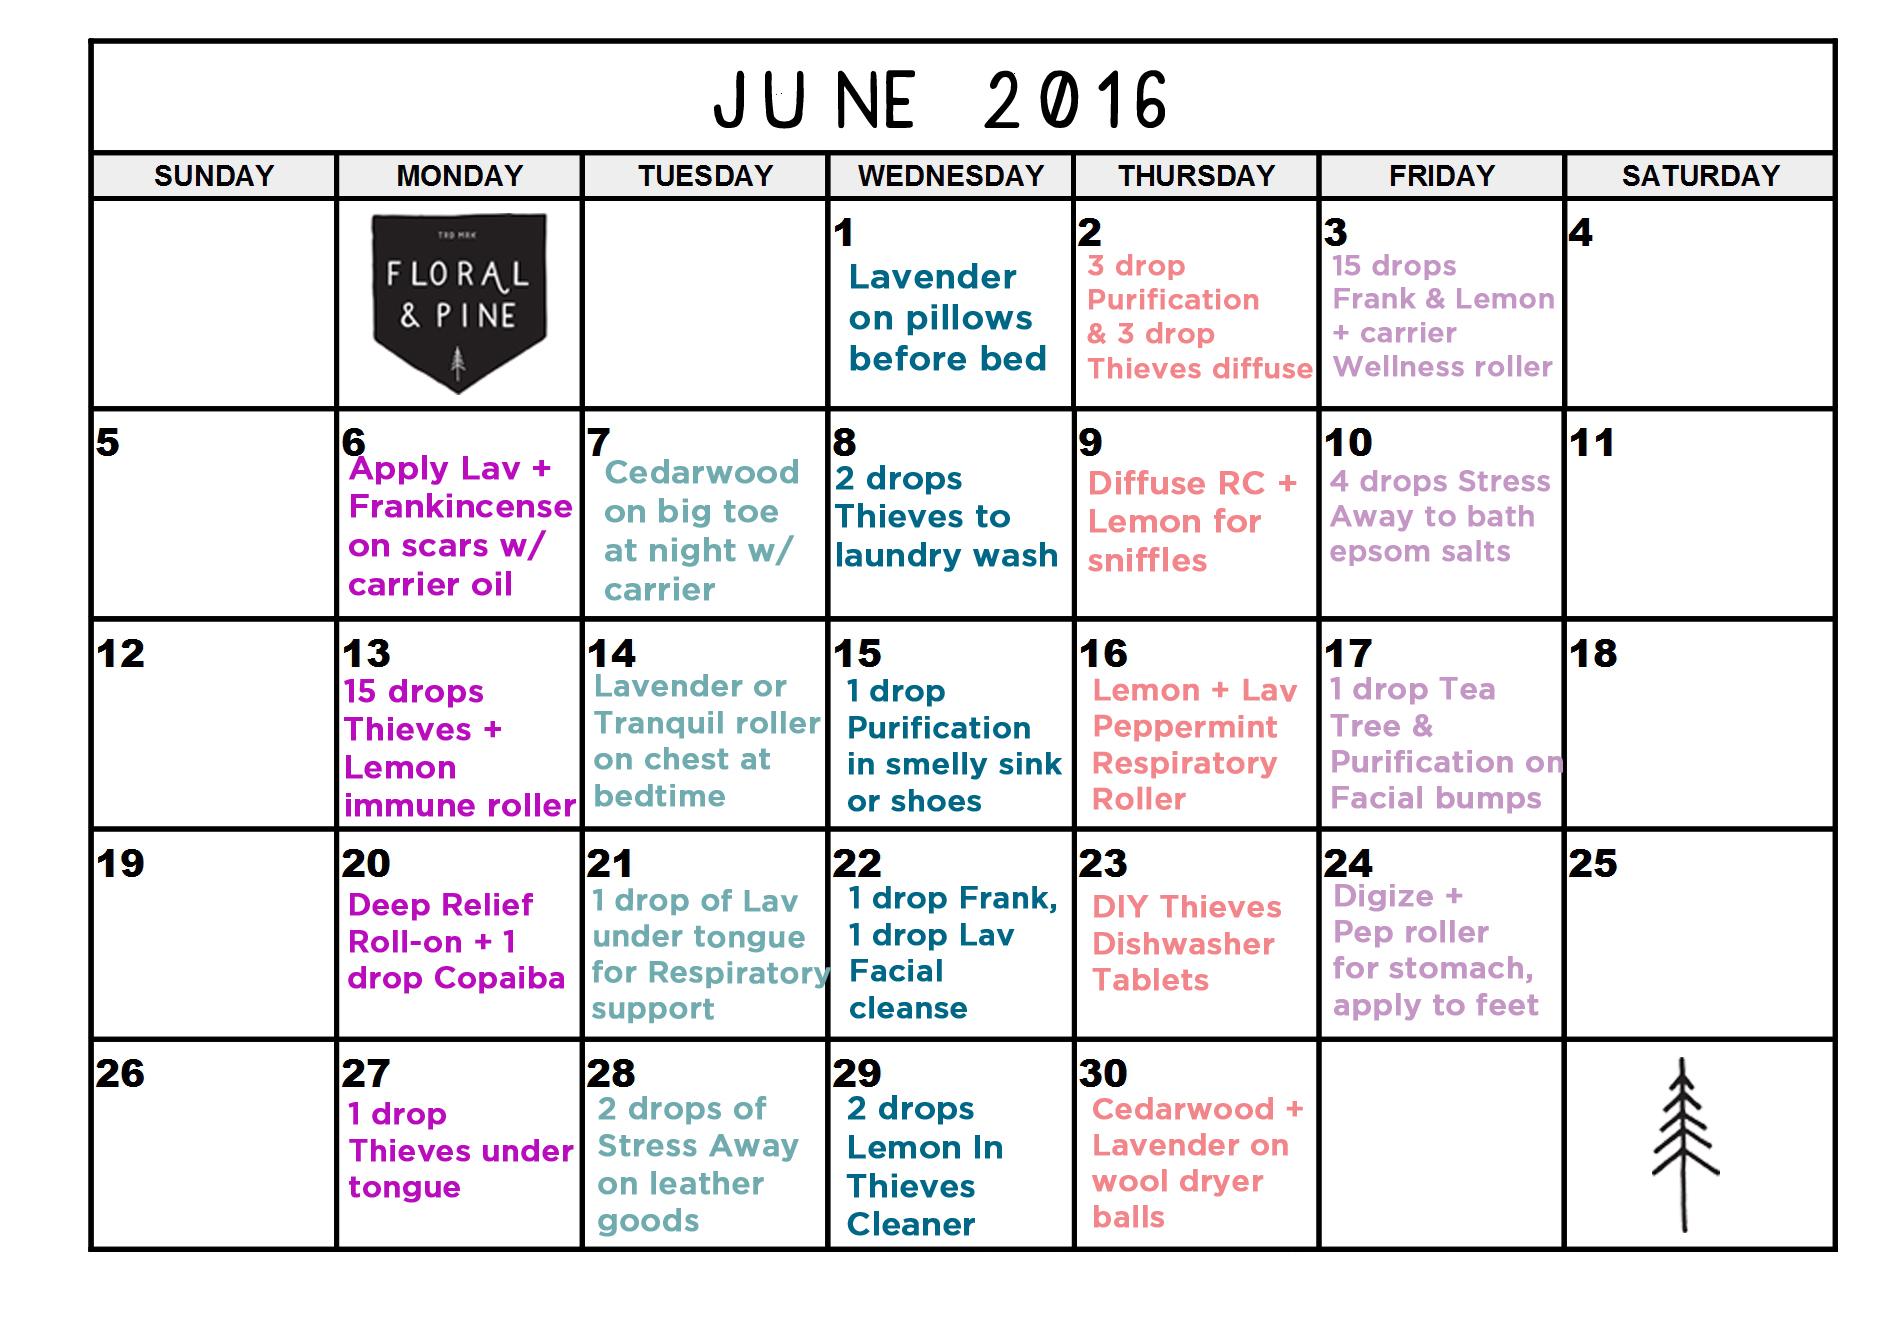 JUNE_2016_DAILYOILS.jpg